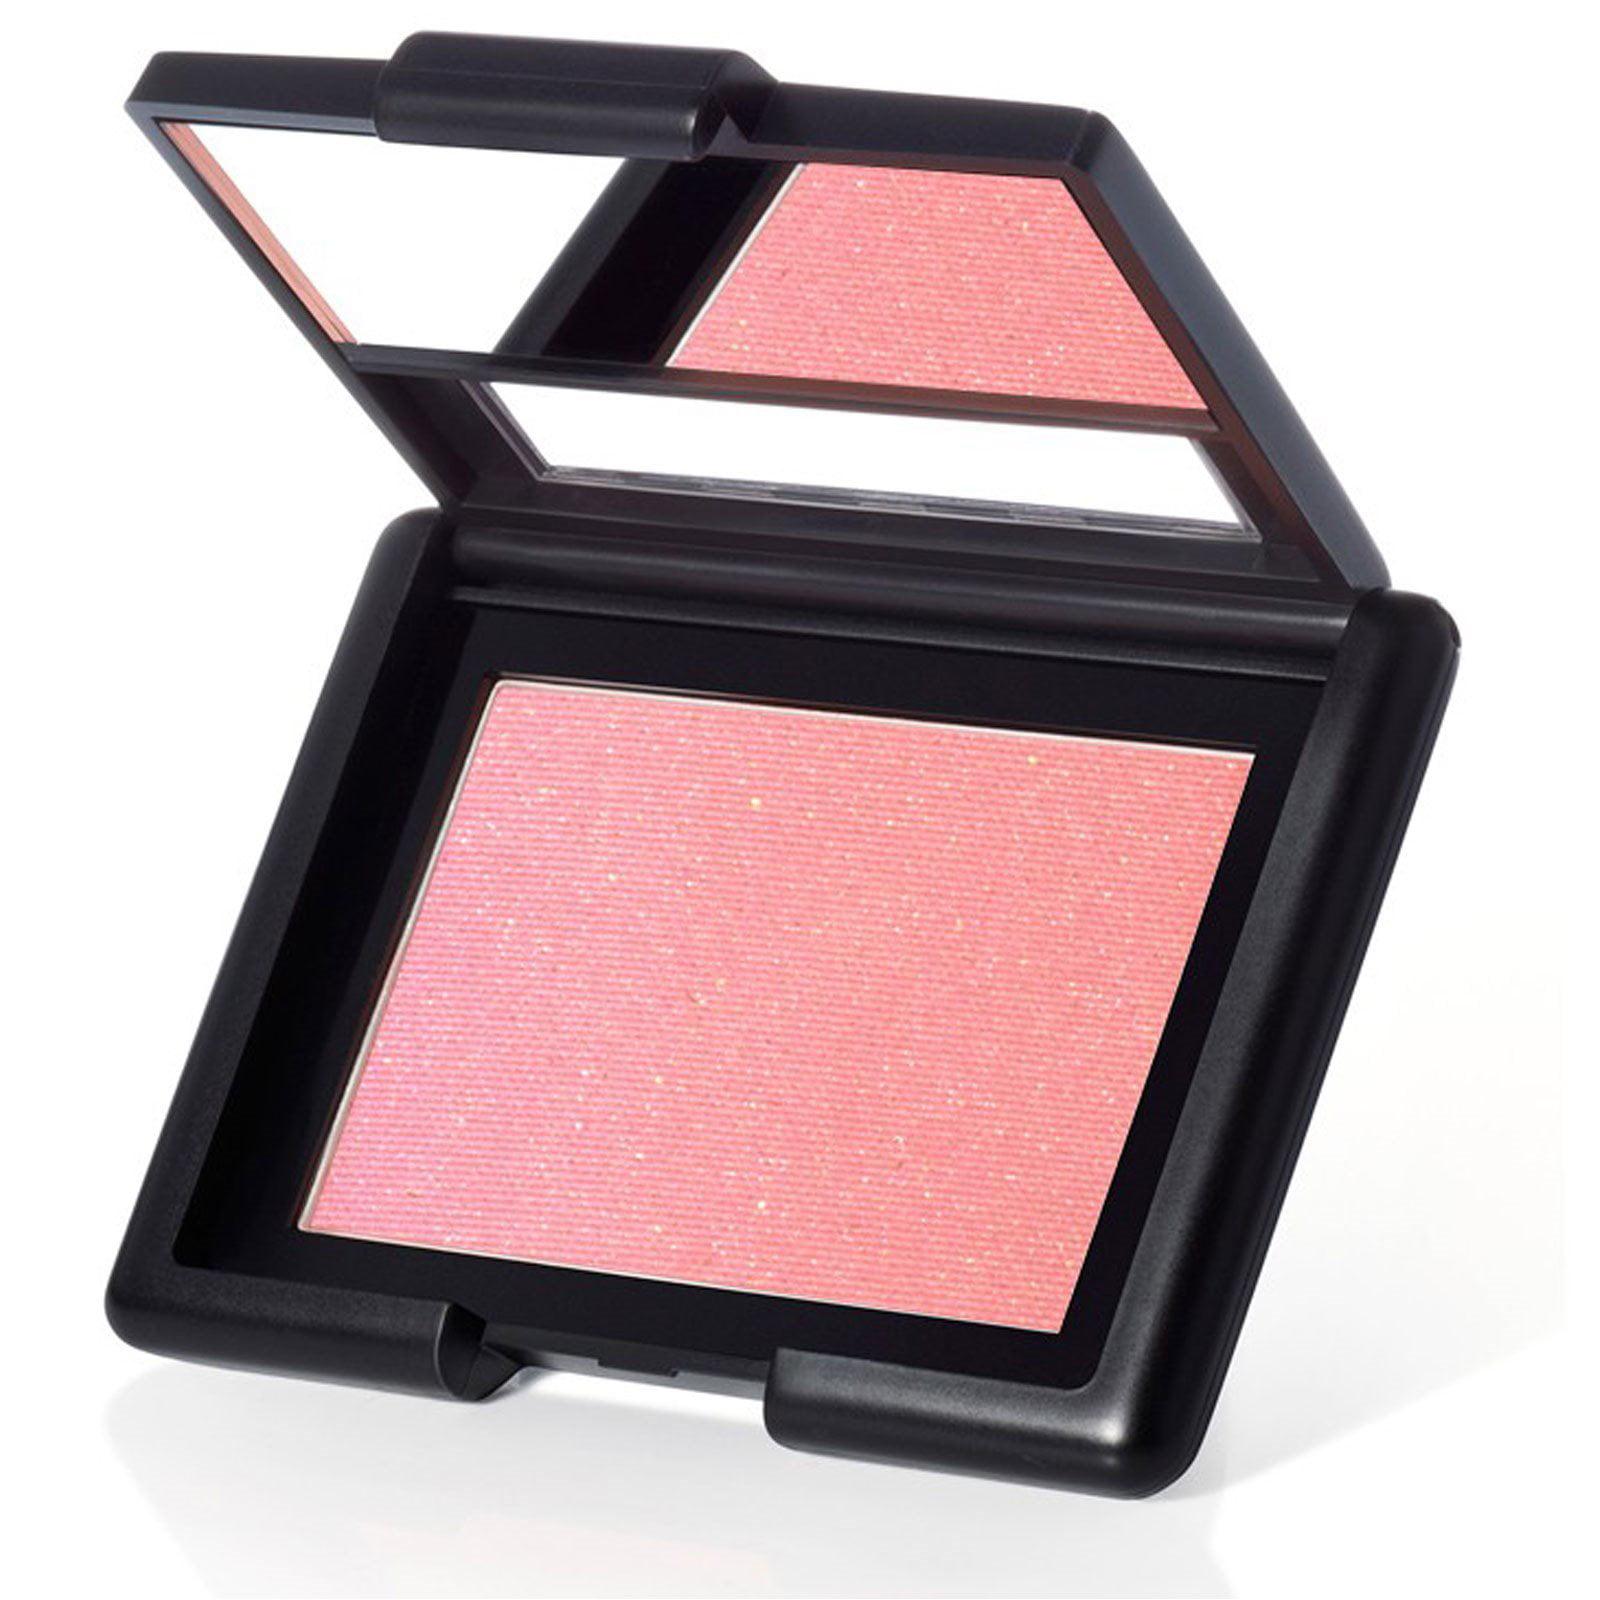 E.L.F. Cosmetics, Blush, Twinkle Pink, 0.17 oz (pack of 12)